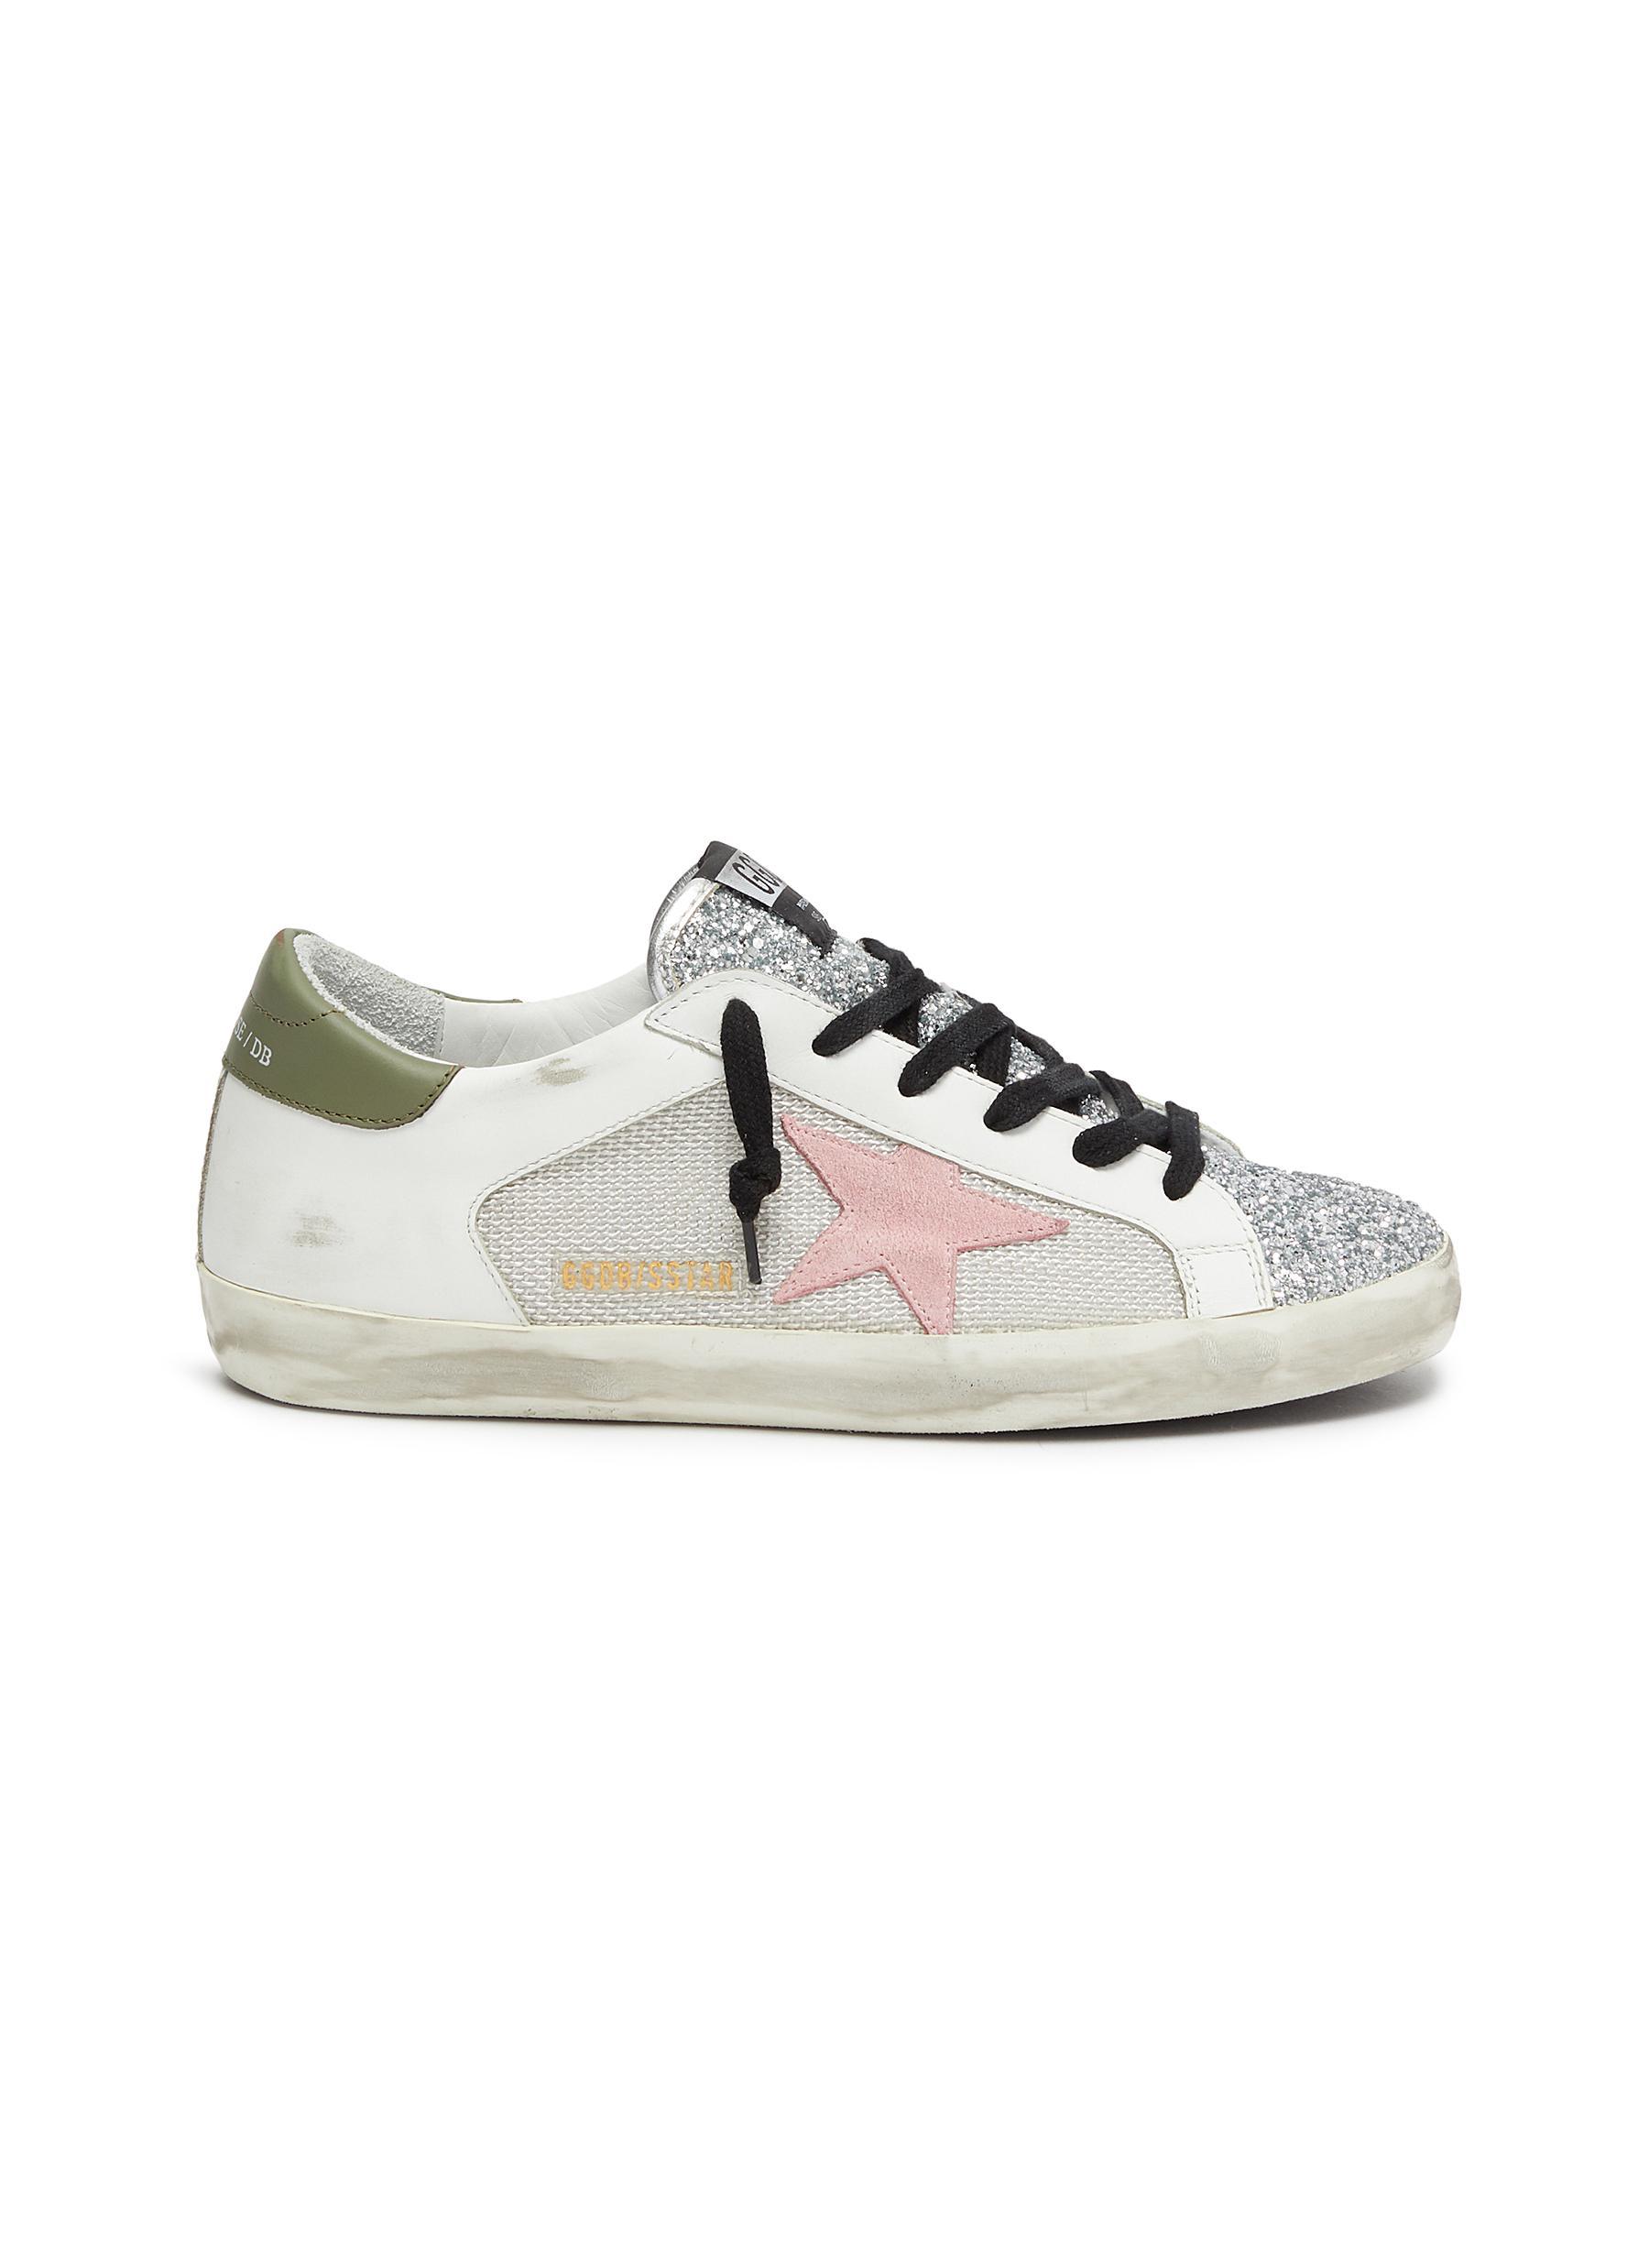 Superstar patchwork sneakers by Golden Goose